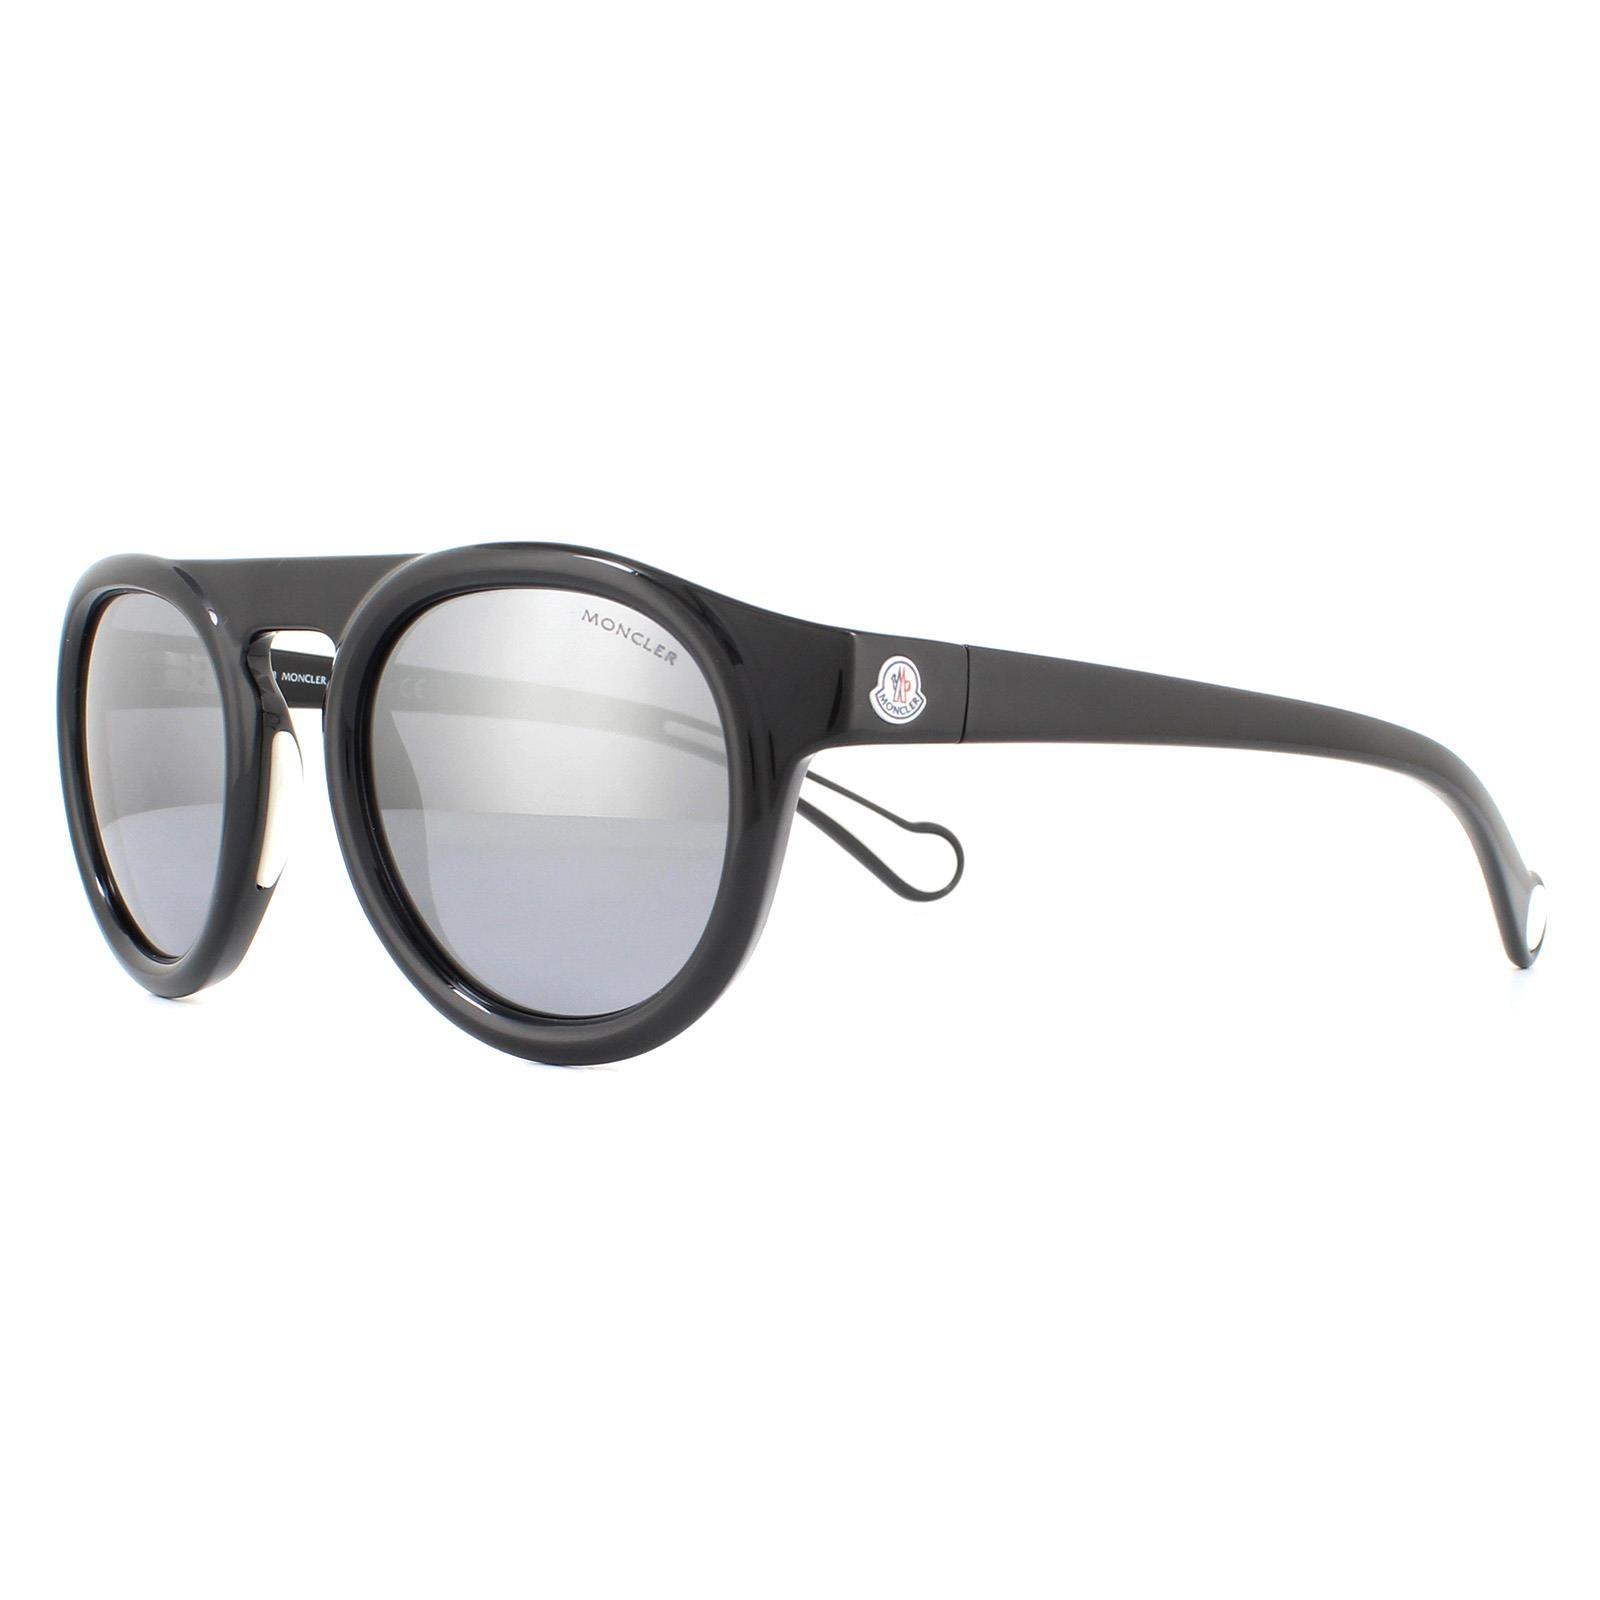 Moncler Sunglasses ML0088 01C Black Smoke Mirror